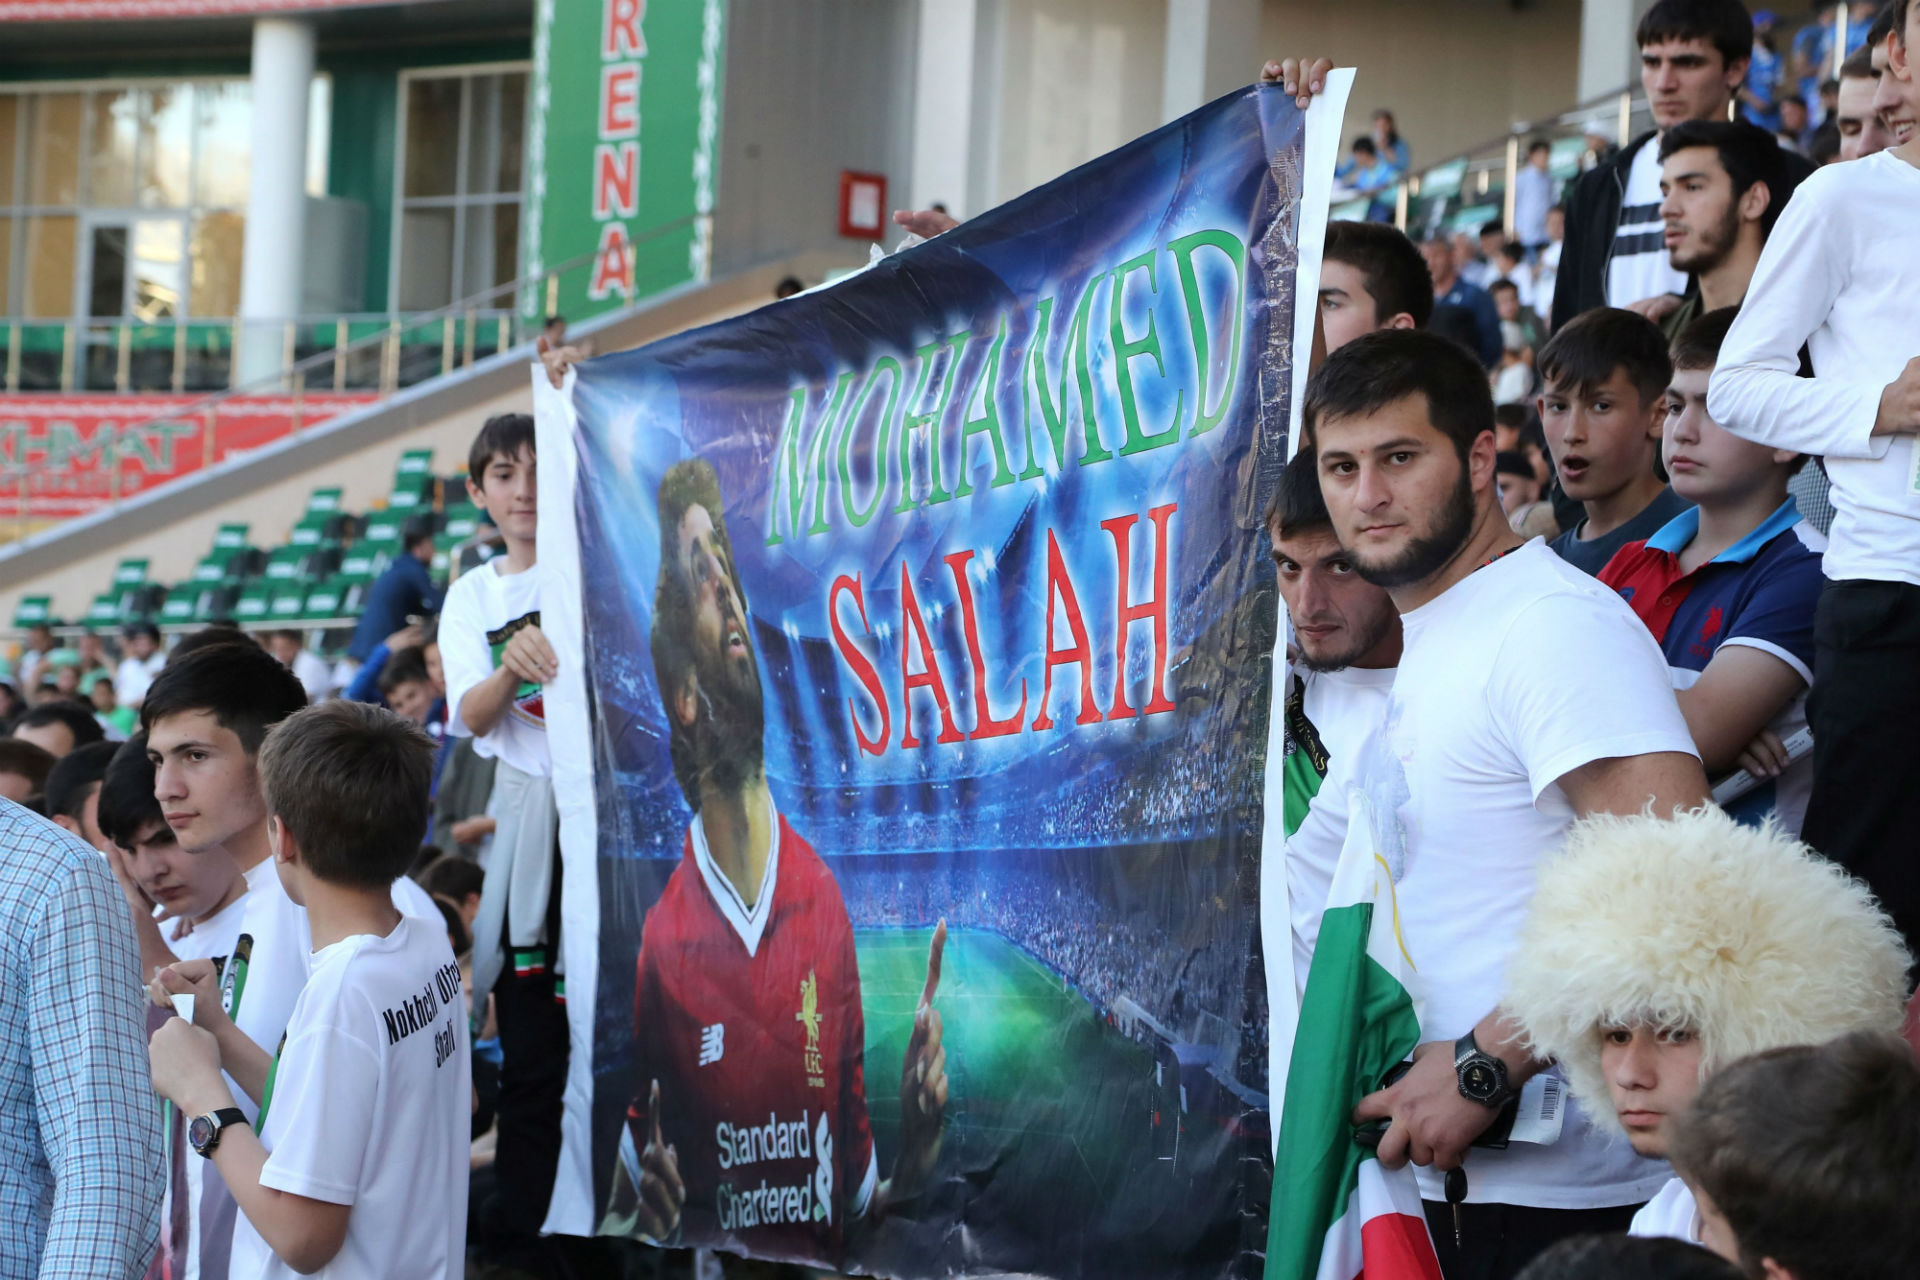 Фанаты в Чечне ждут приезда Салаха